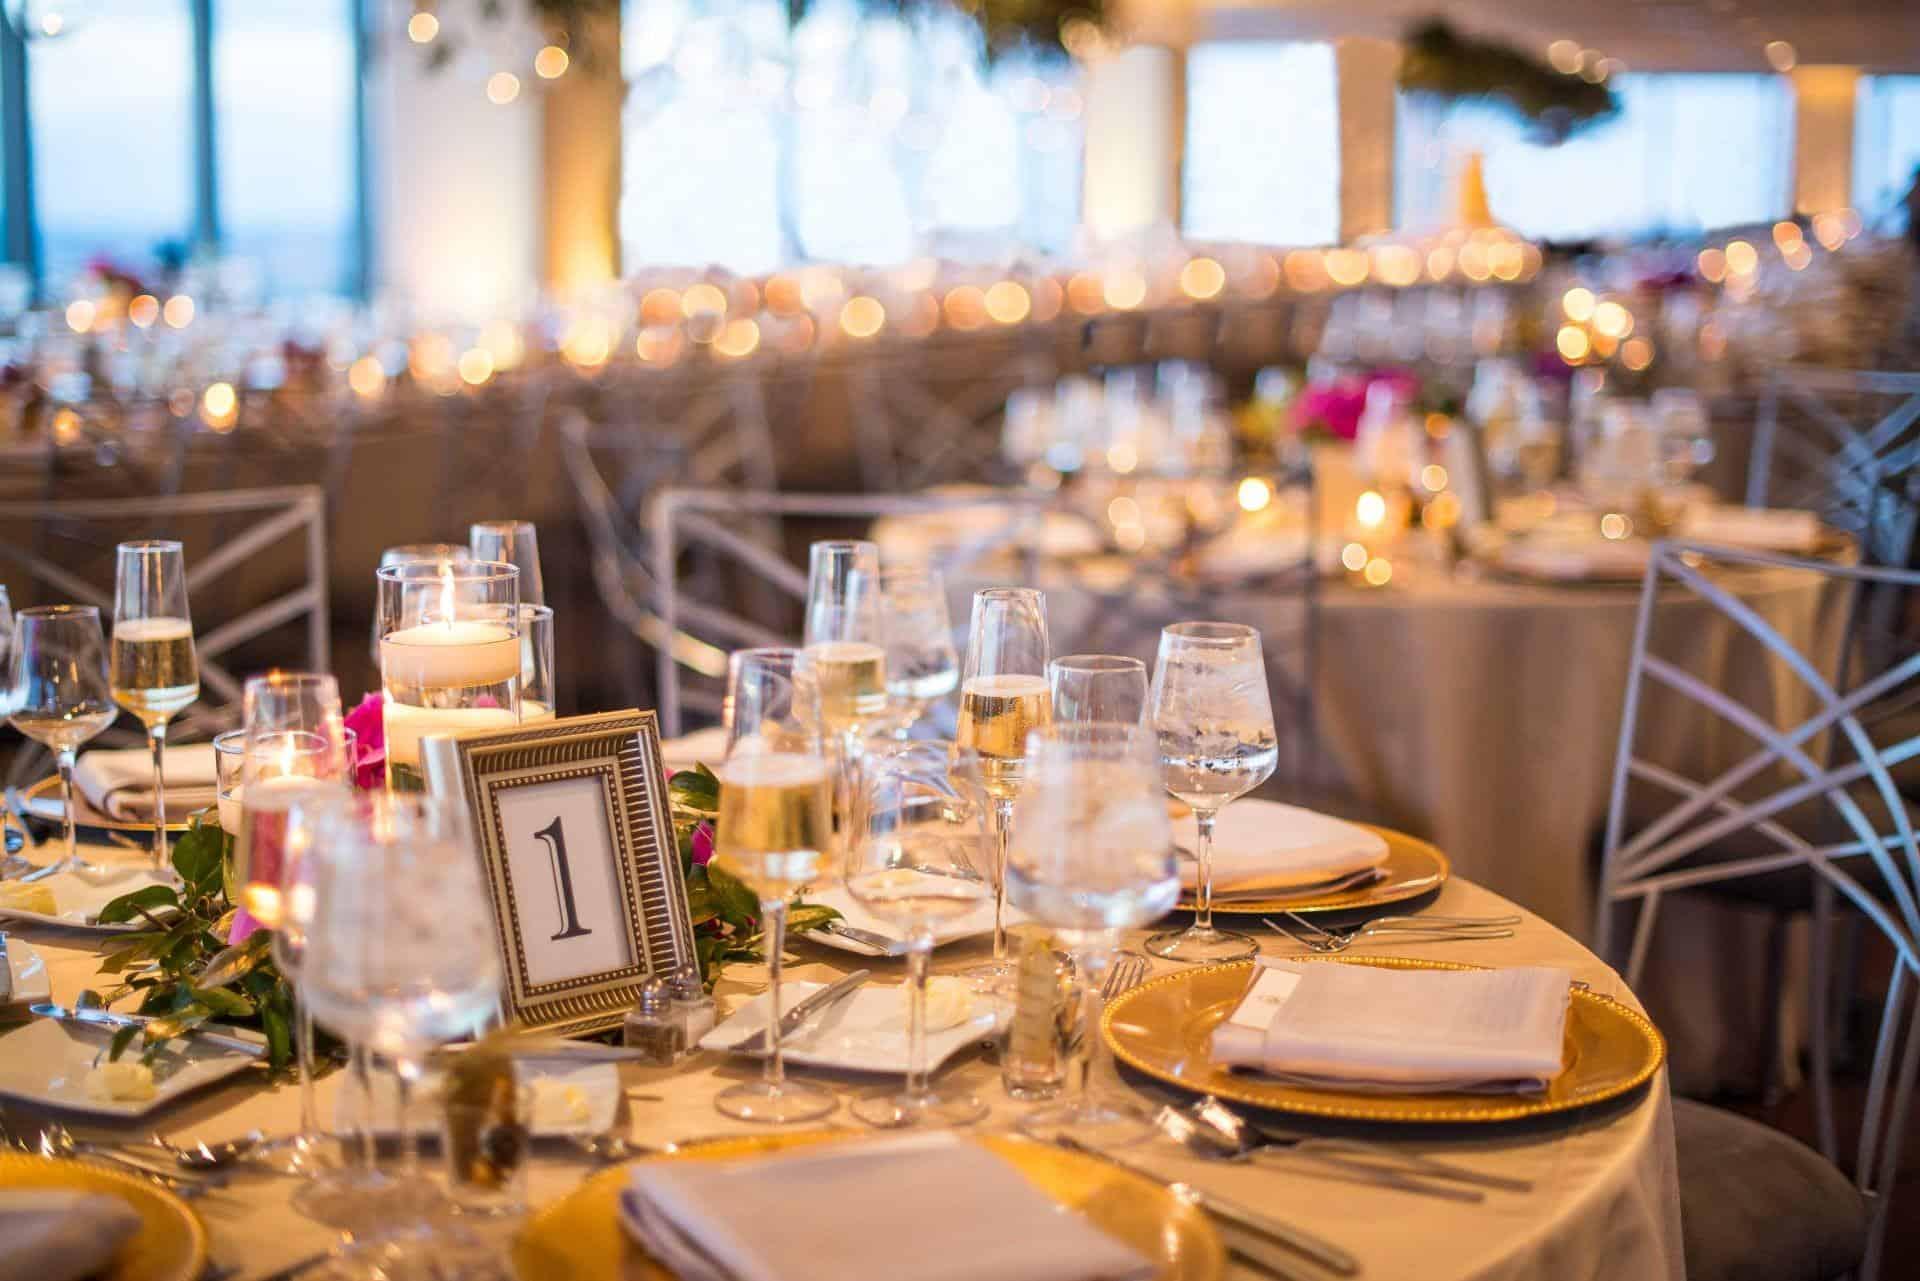 Not Attend – wedding etiquette